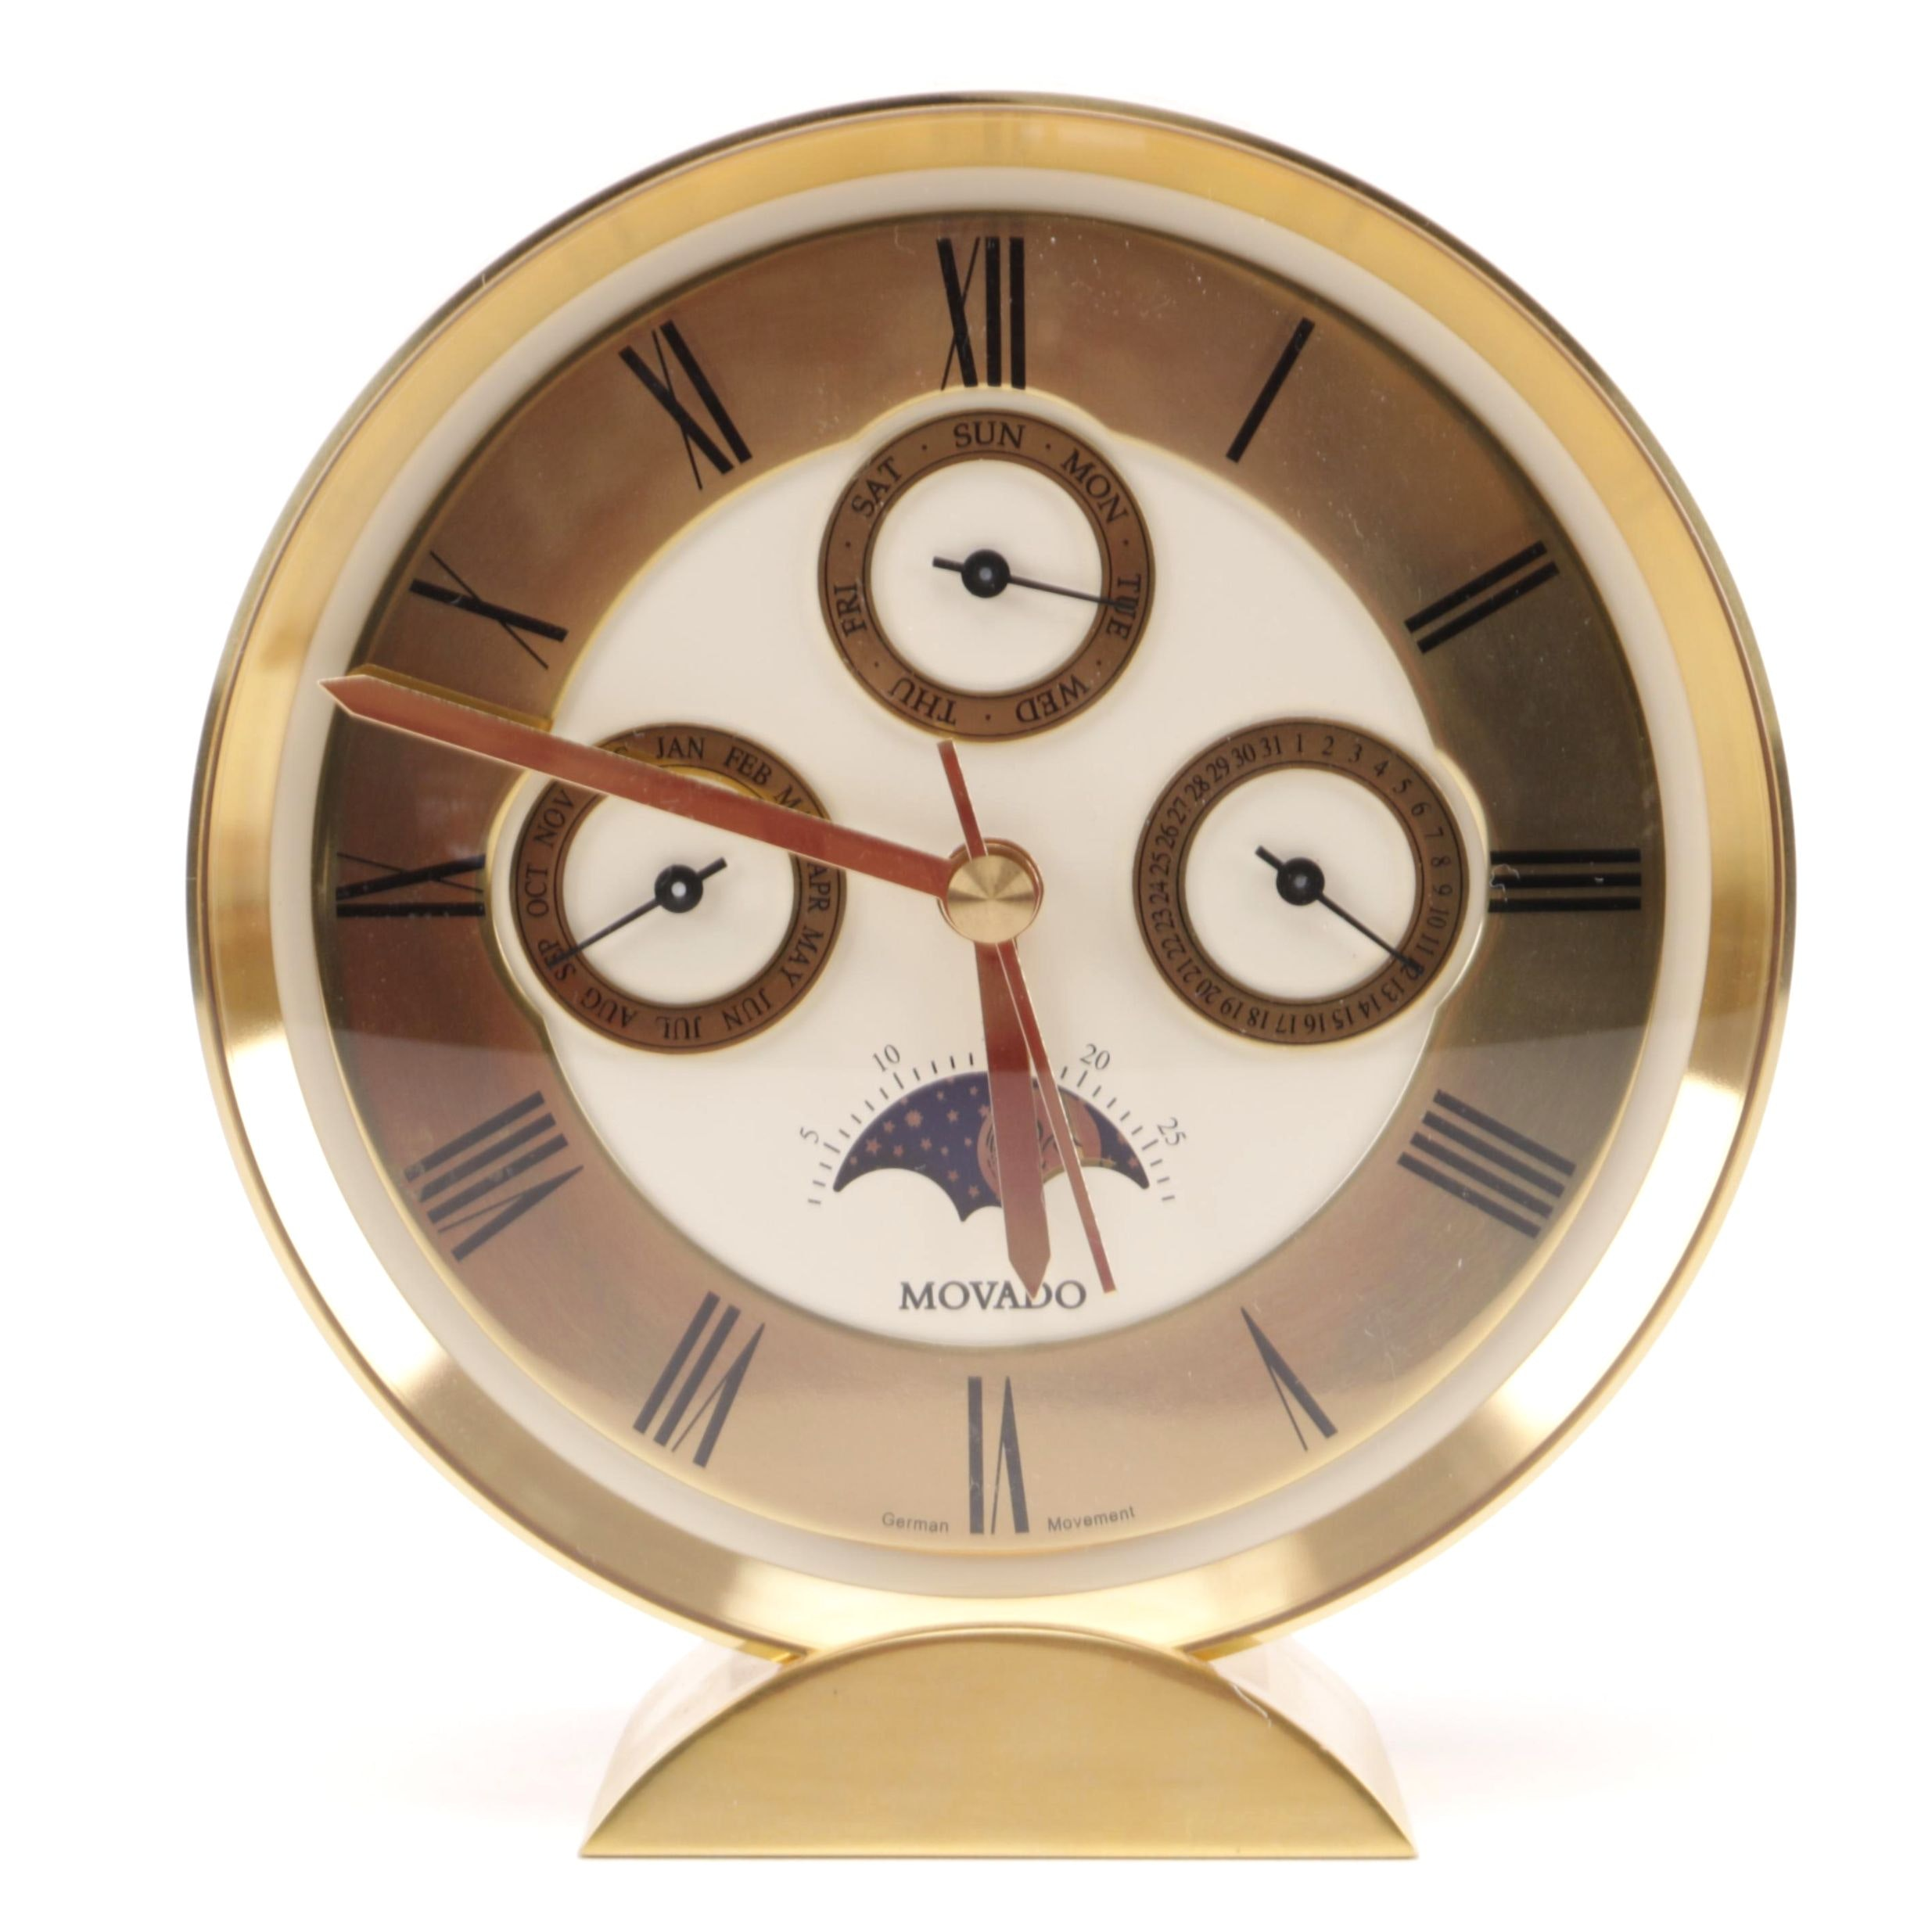 Vintage Brass Chronograph Clock by Movado